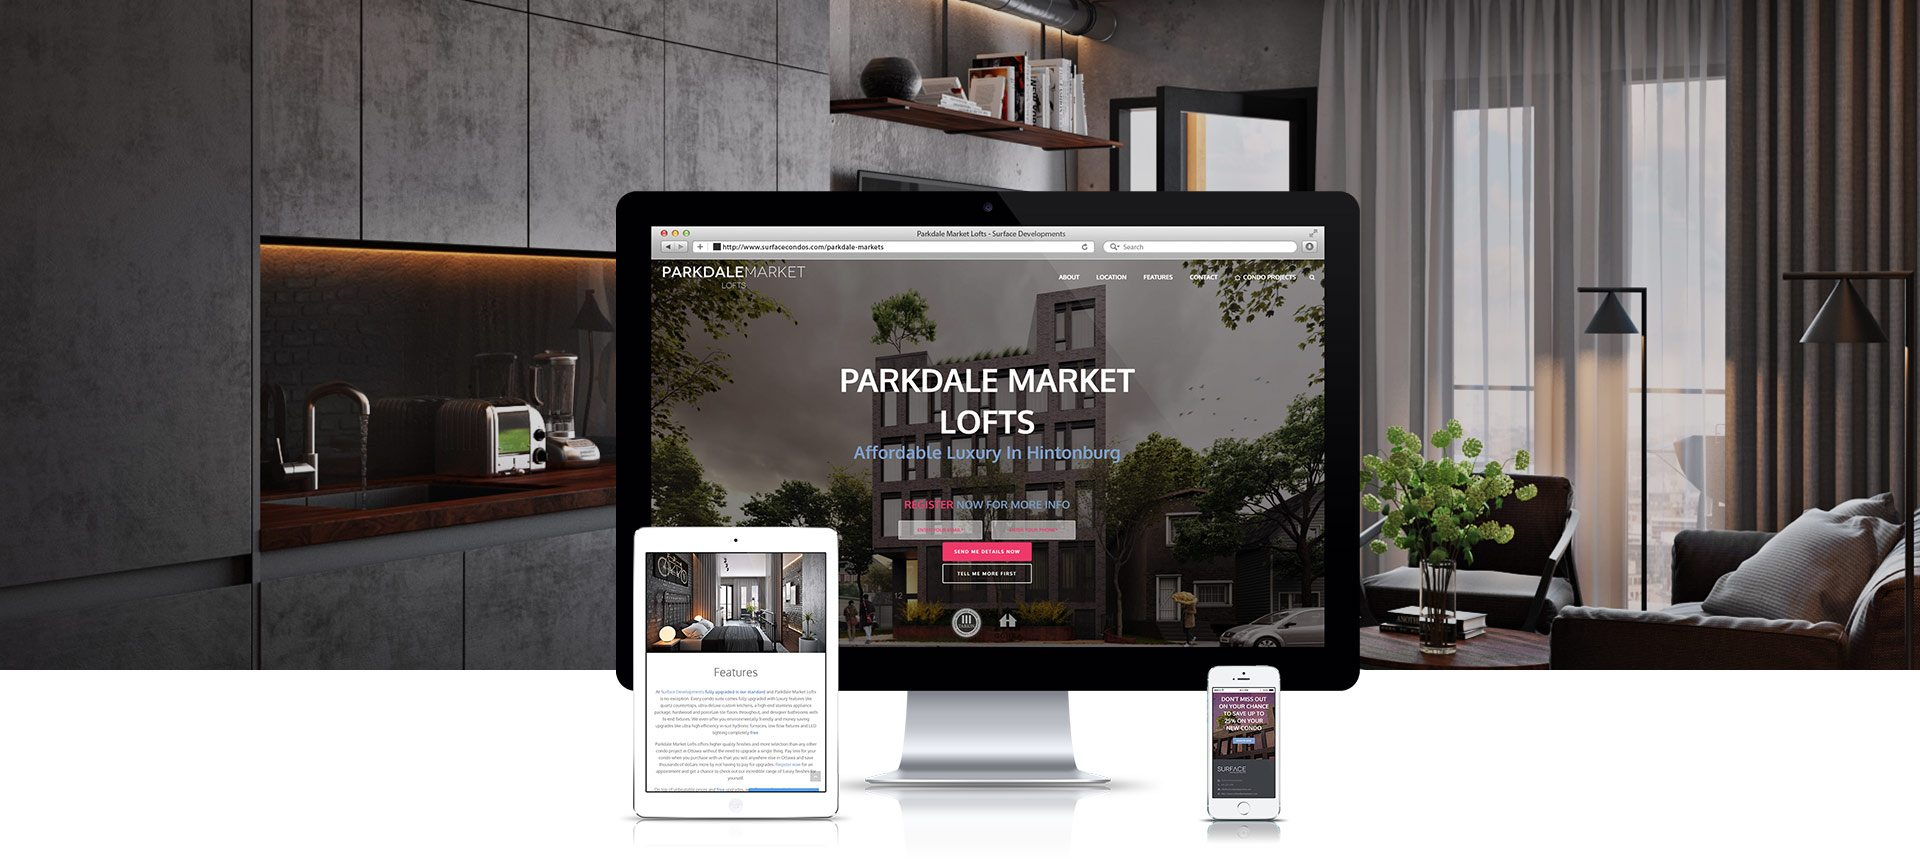 parkdale-market-lofts